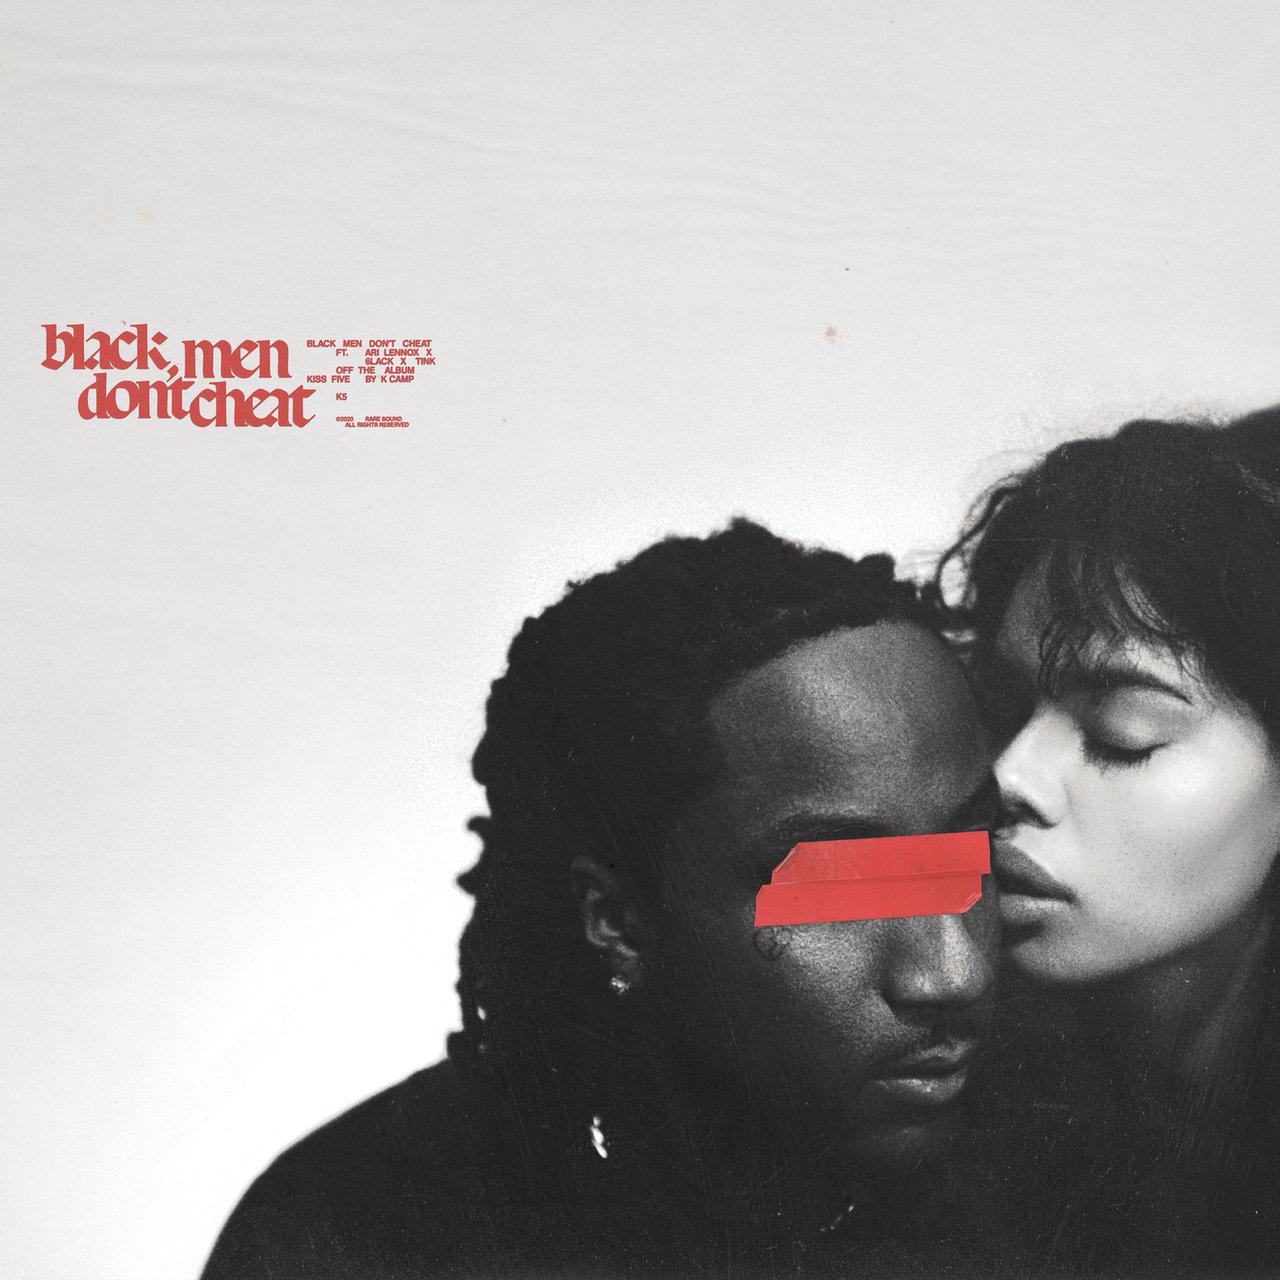 K Camp - Black Men Don't Cheat (ft. Ari Lennox, 6lack and Tink) (Cover)